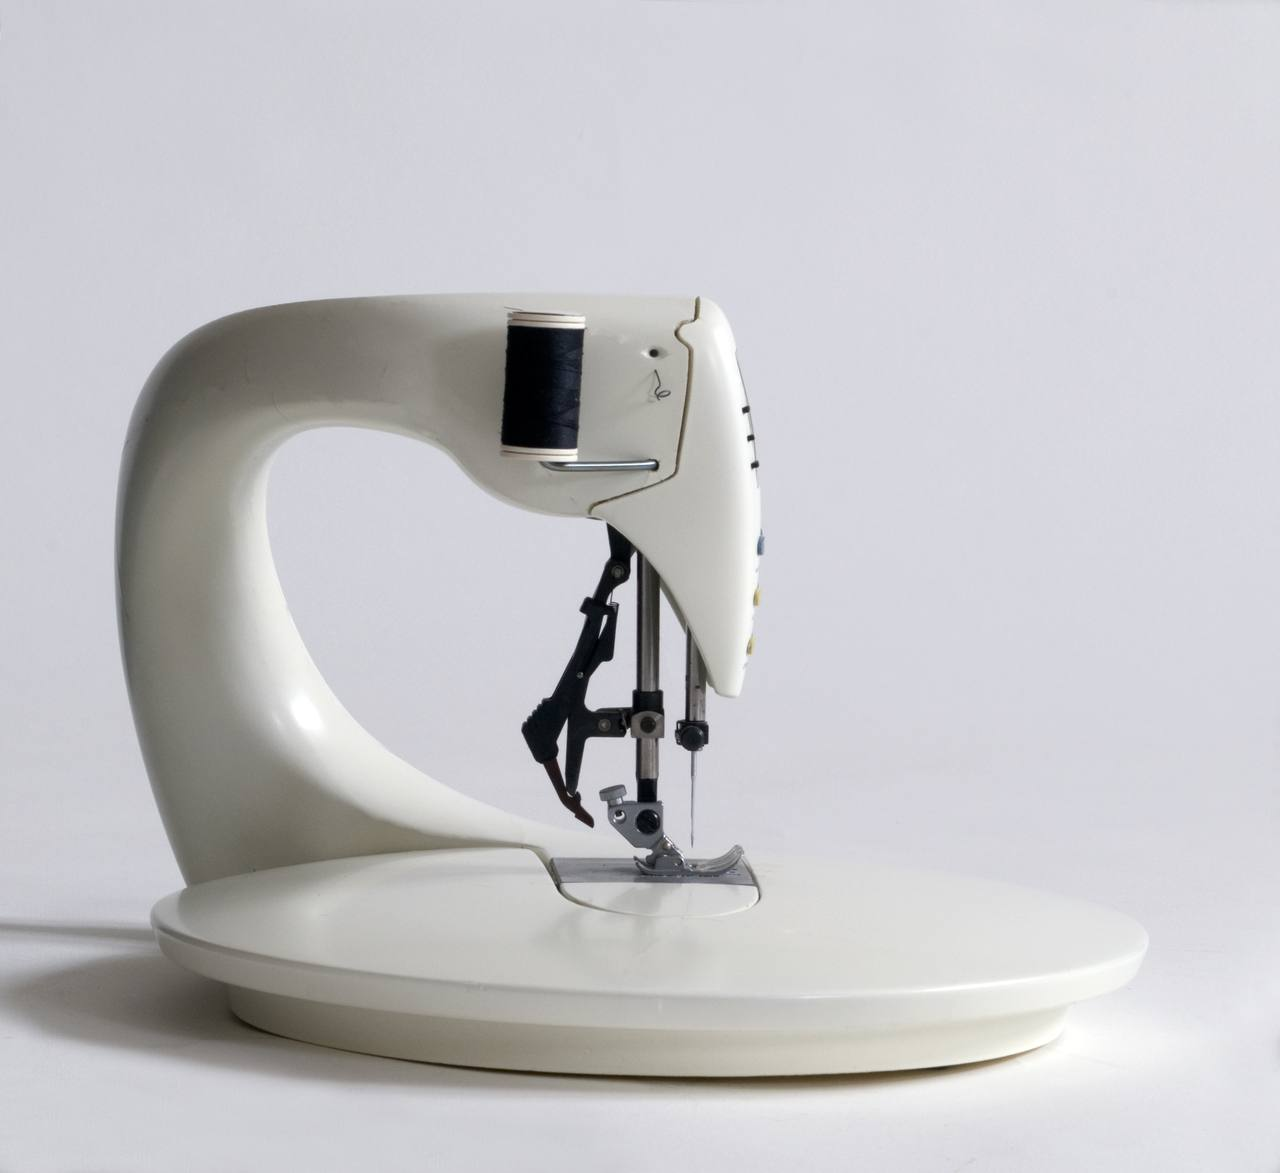 'SEWING MACHINE' / 1993 / for Design Academy Eindhoven